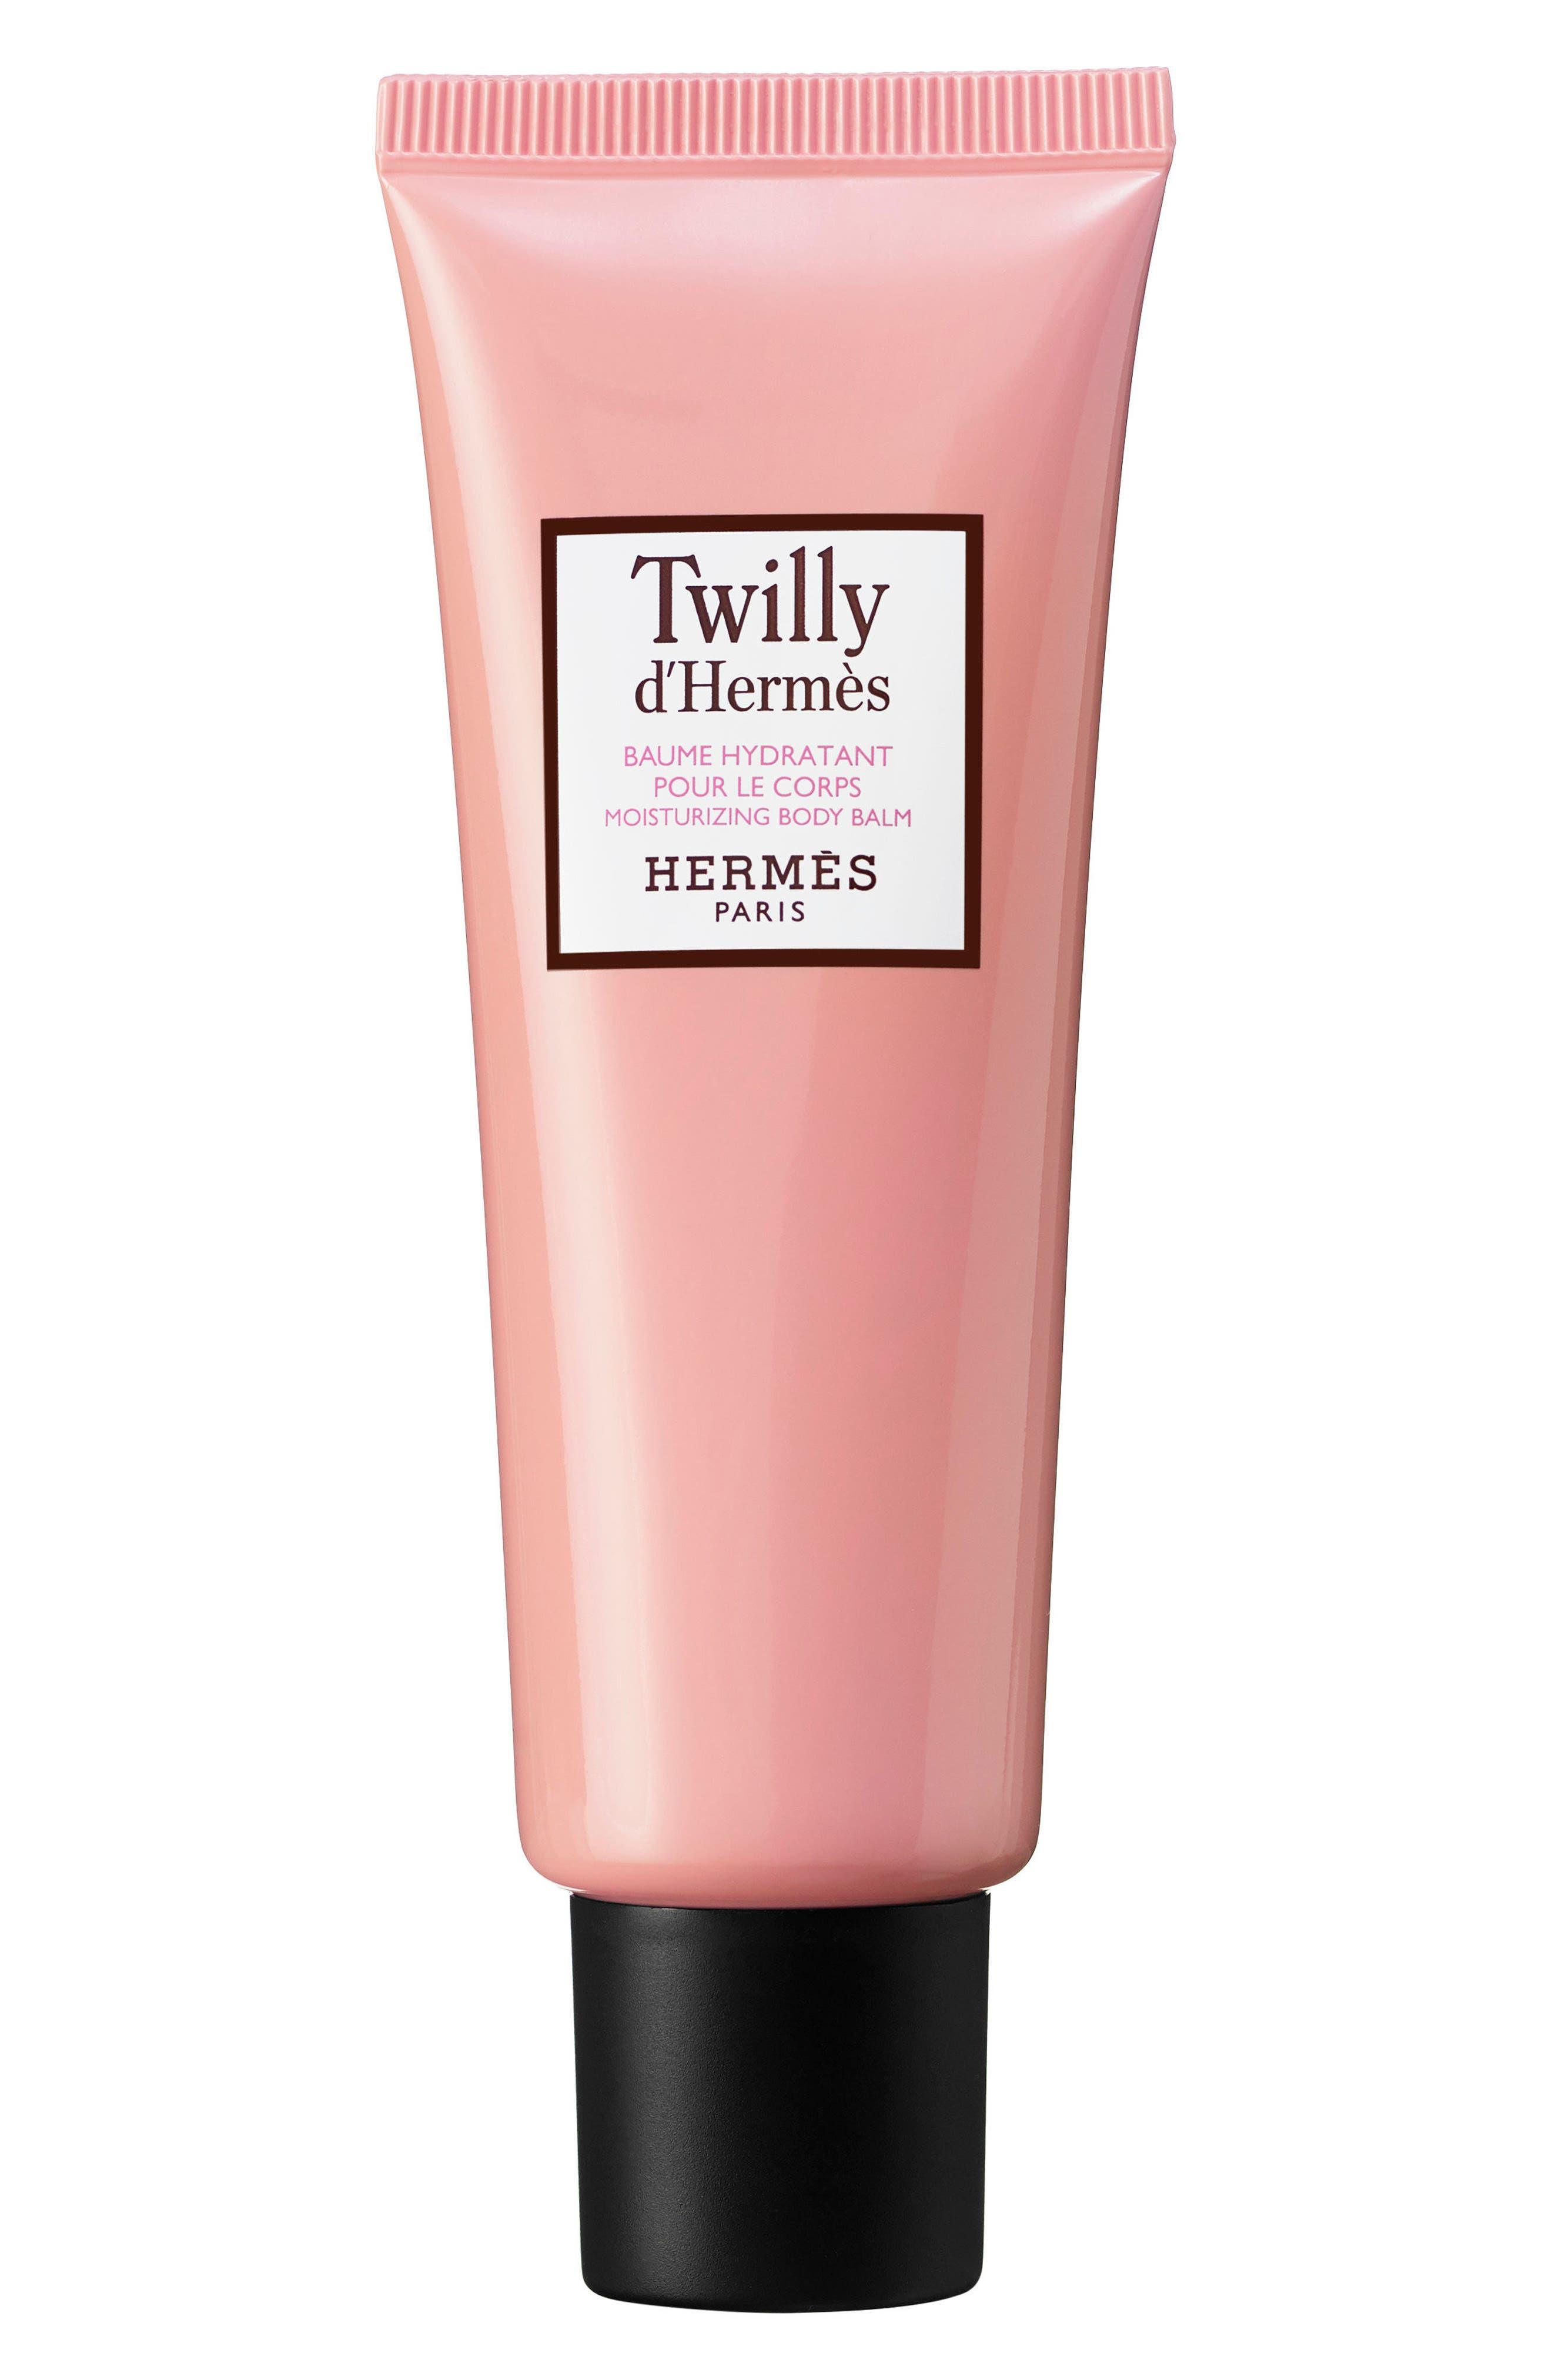 HERMÈS, Twilly d'Hermès - Moisturizing body balm, Main thumbnail 1, color, NO COLOR